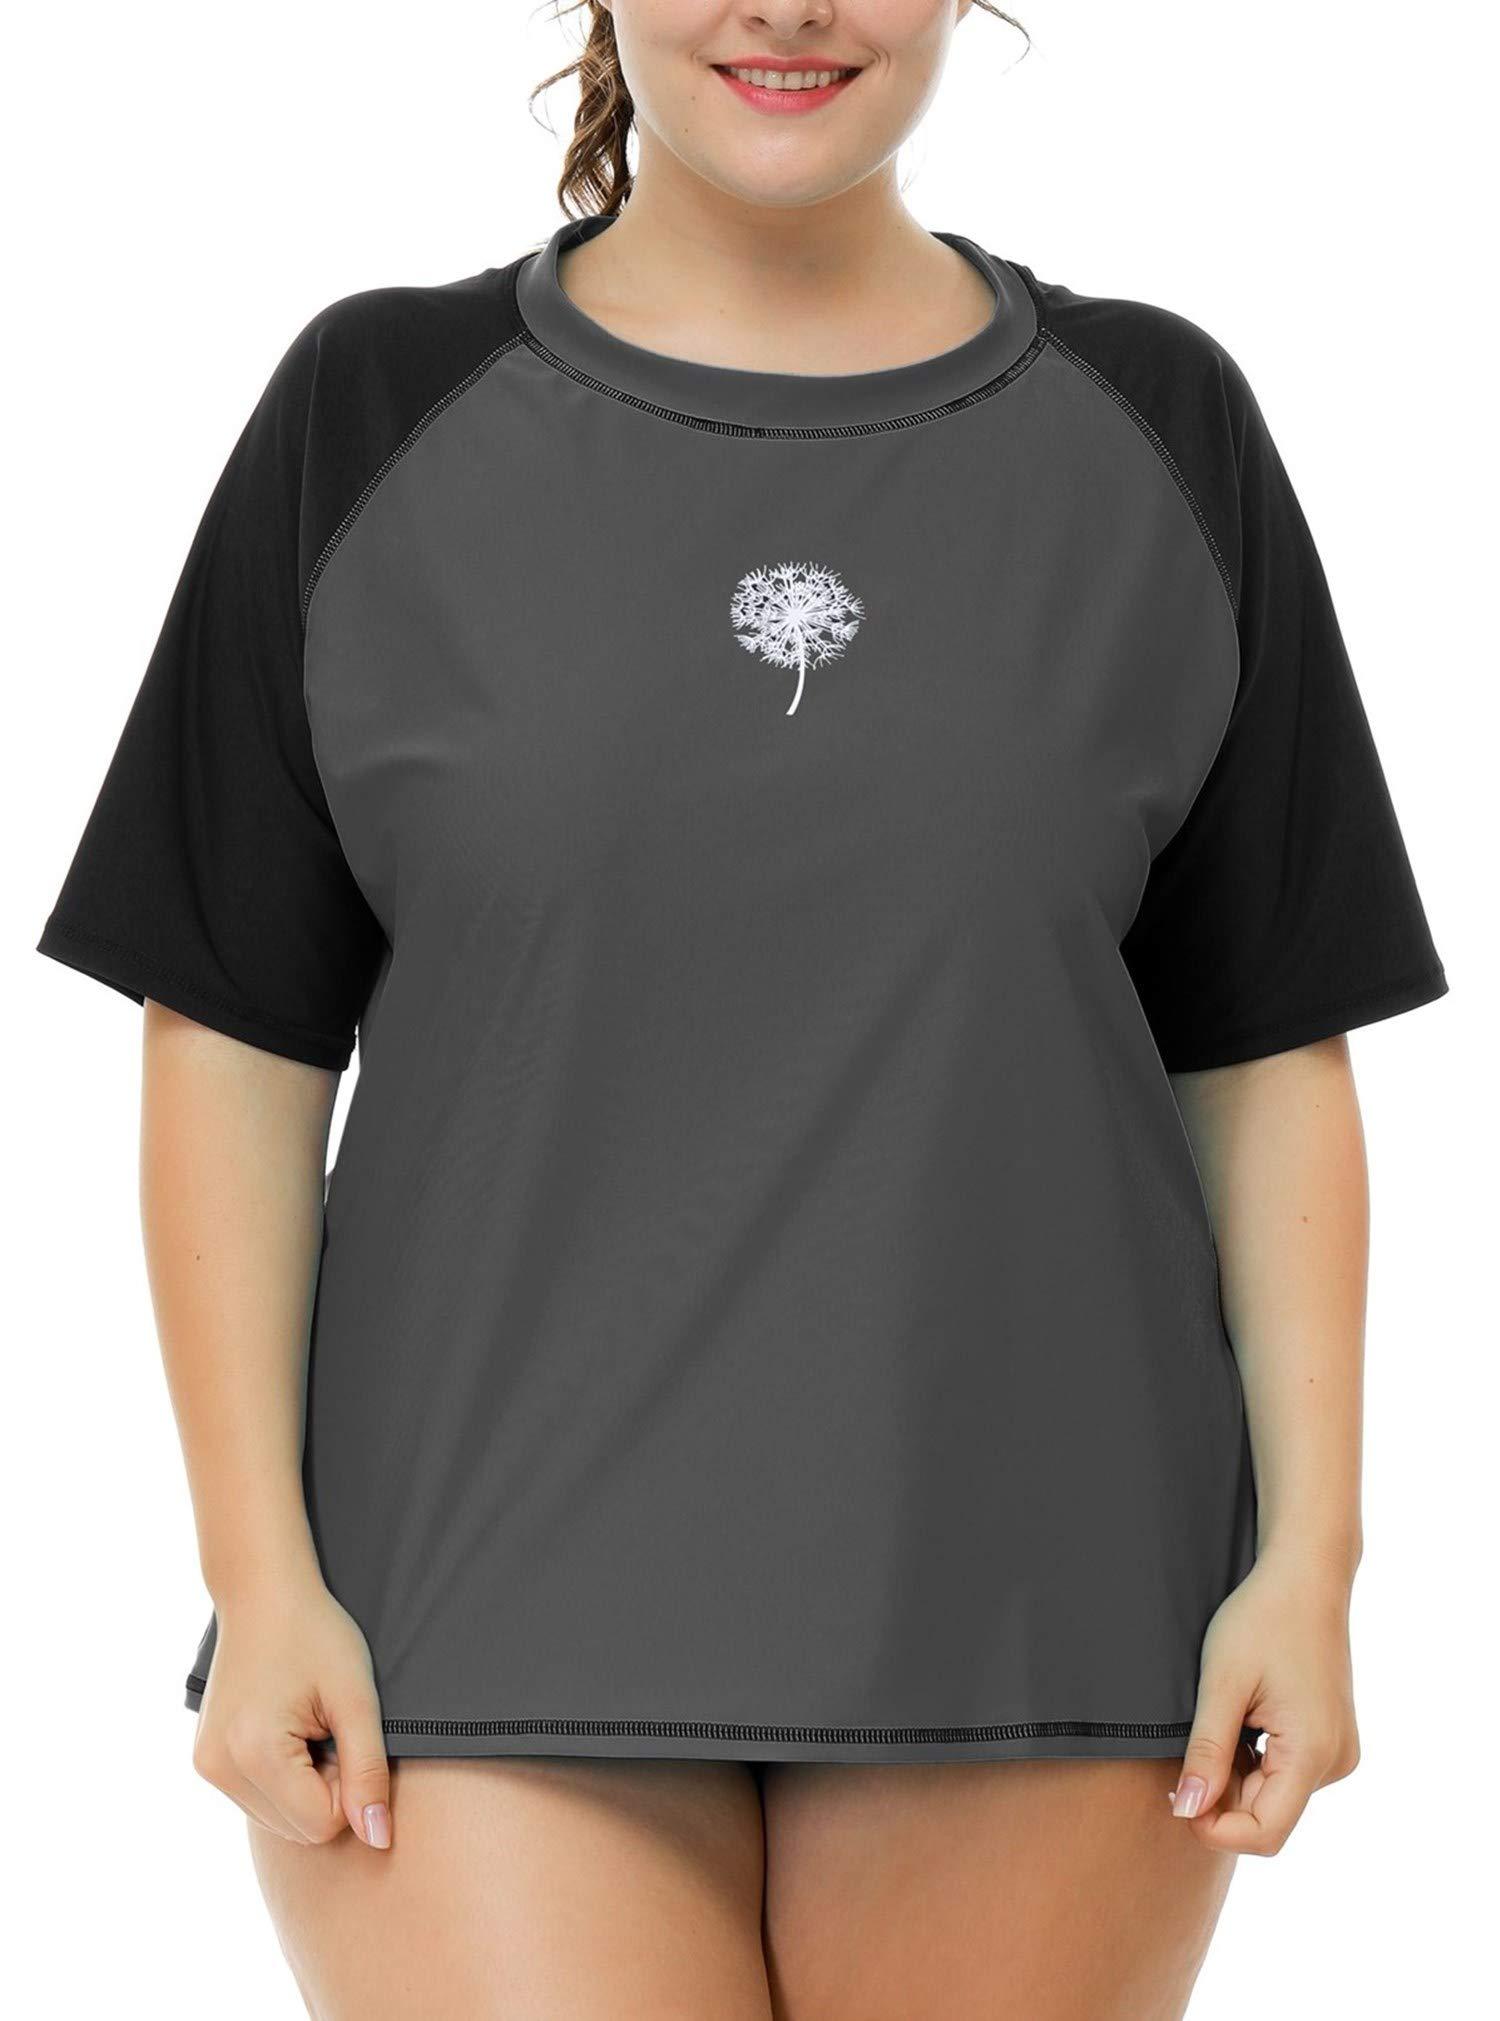 Anwell Ladies Short Sleeve Rash Guard Shirt Plus Size Loose Fit UV Shirt Gray 2X by Anwell (Image #2)